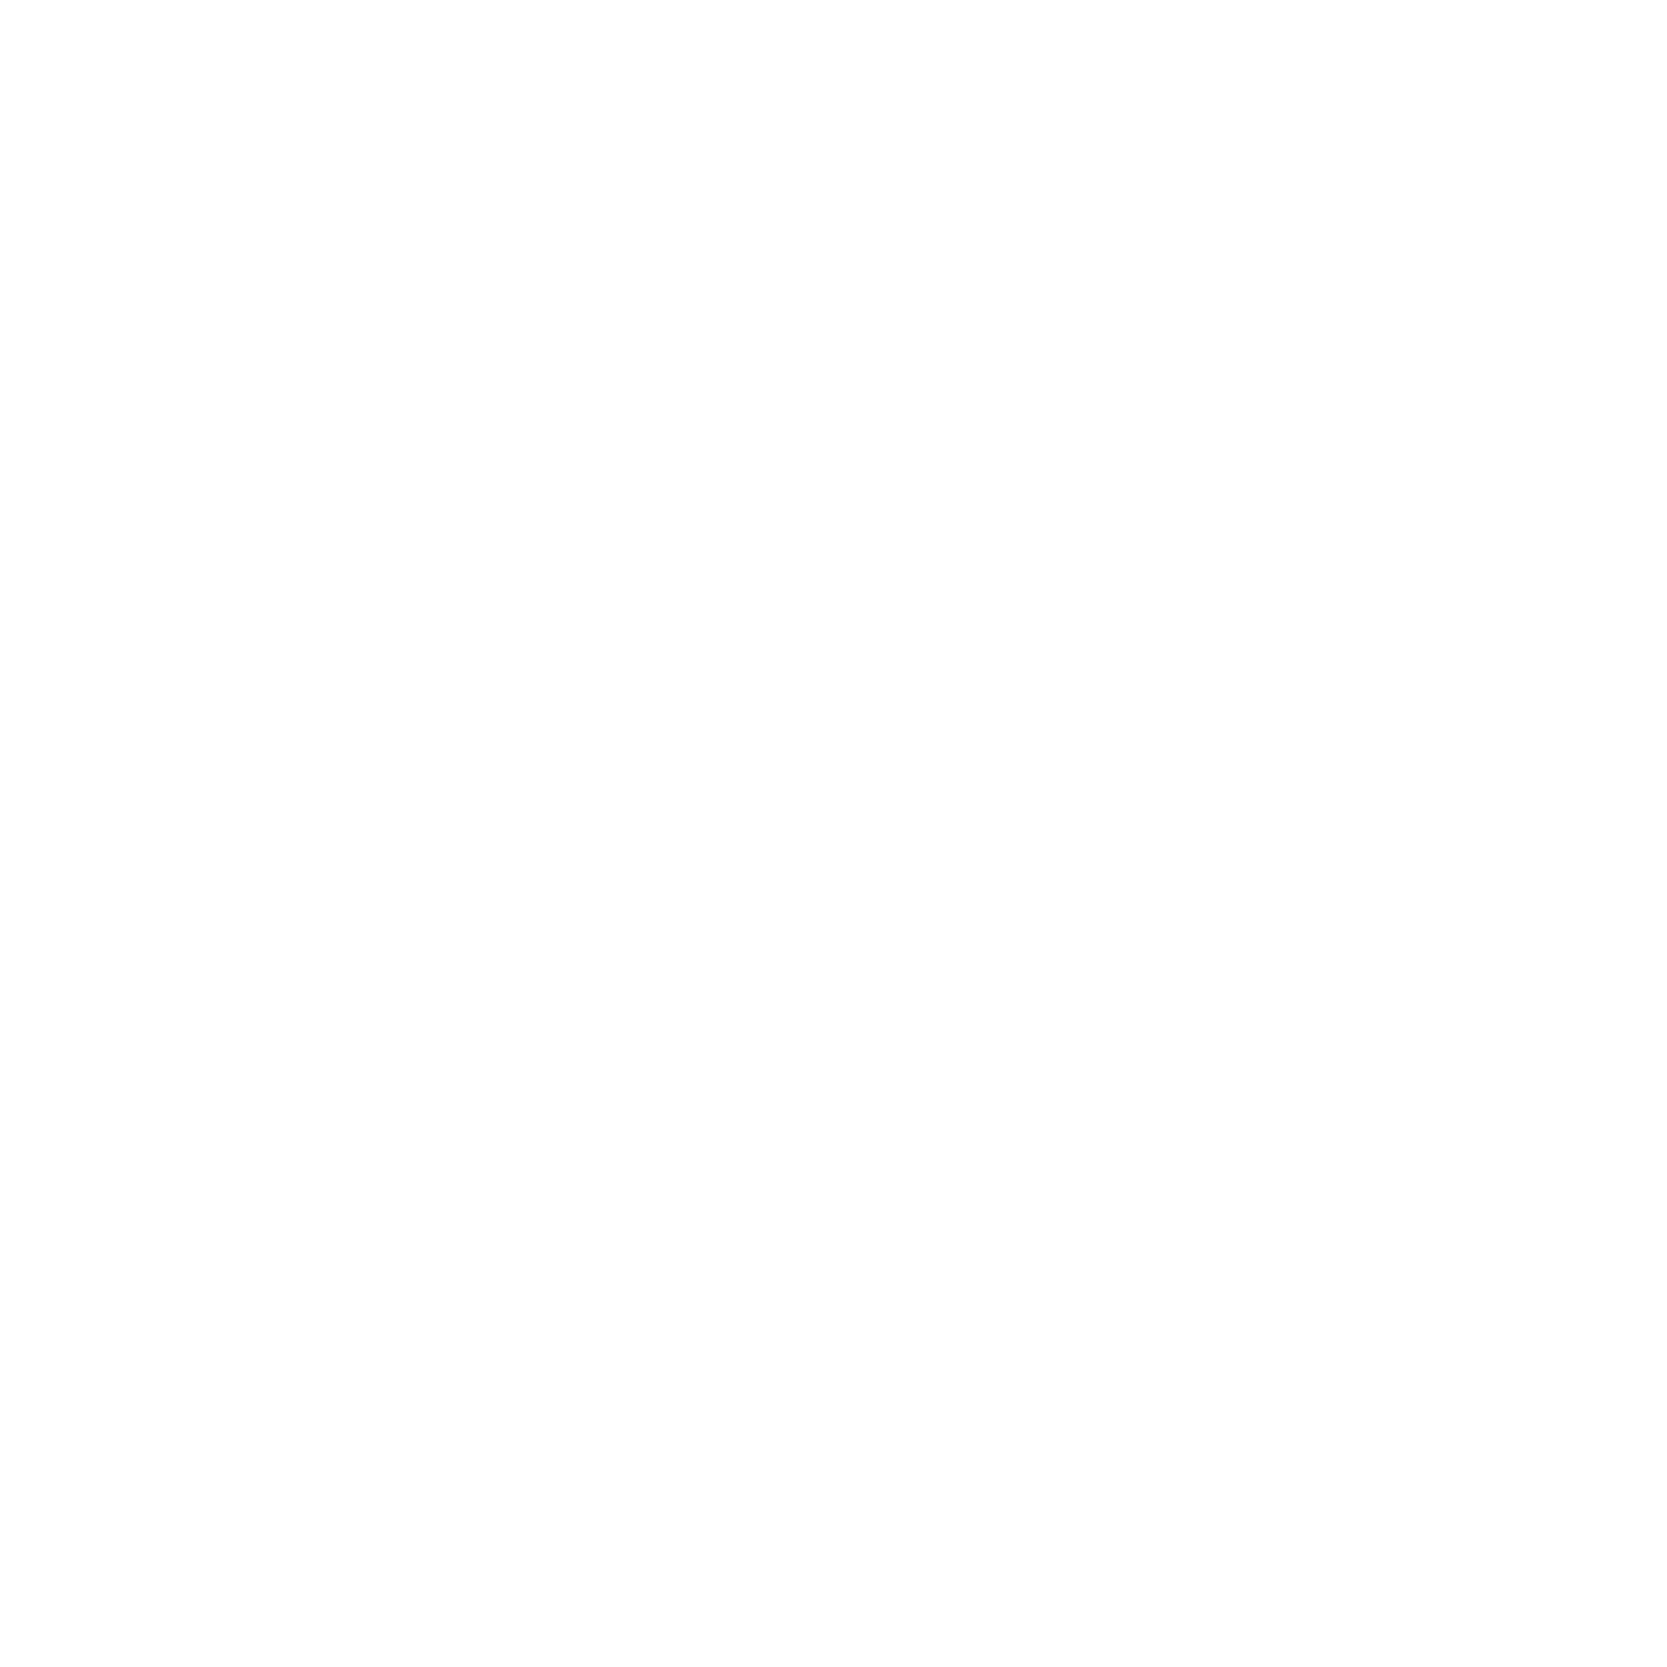 Playcore-logo-white-01.png